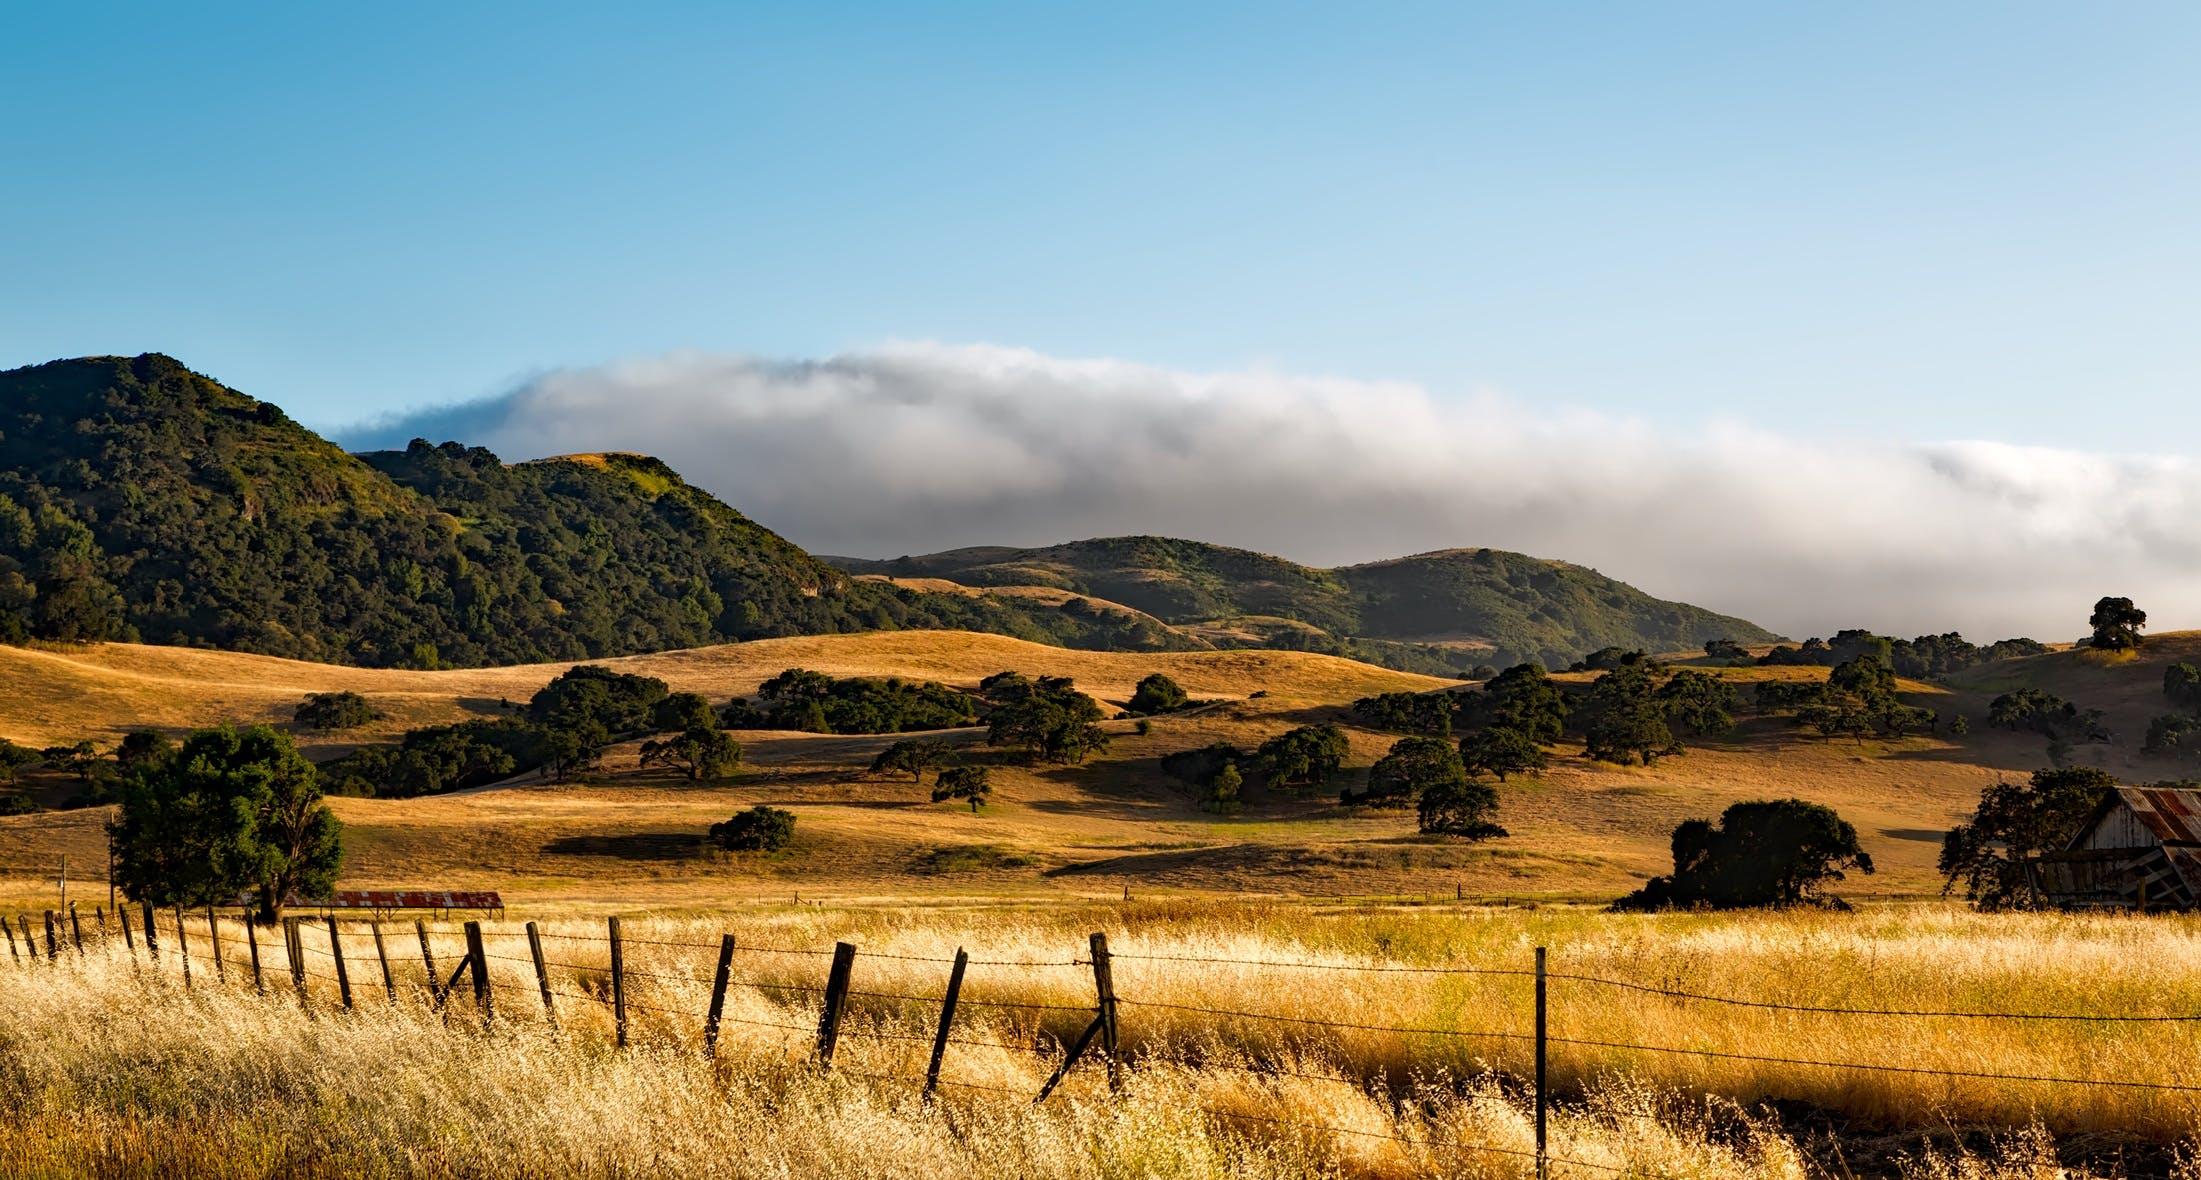 https://images.pexels.com/photos/158220/california-mountains-landscape-scenic-158220.jpeg?auto=compress&cs=tinysrgb&dpr=2&h=350